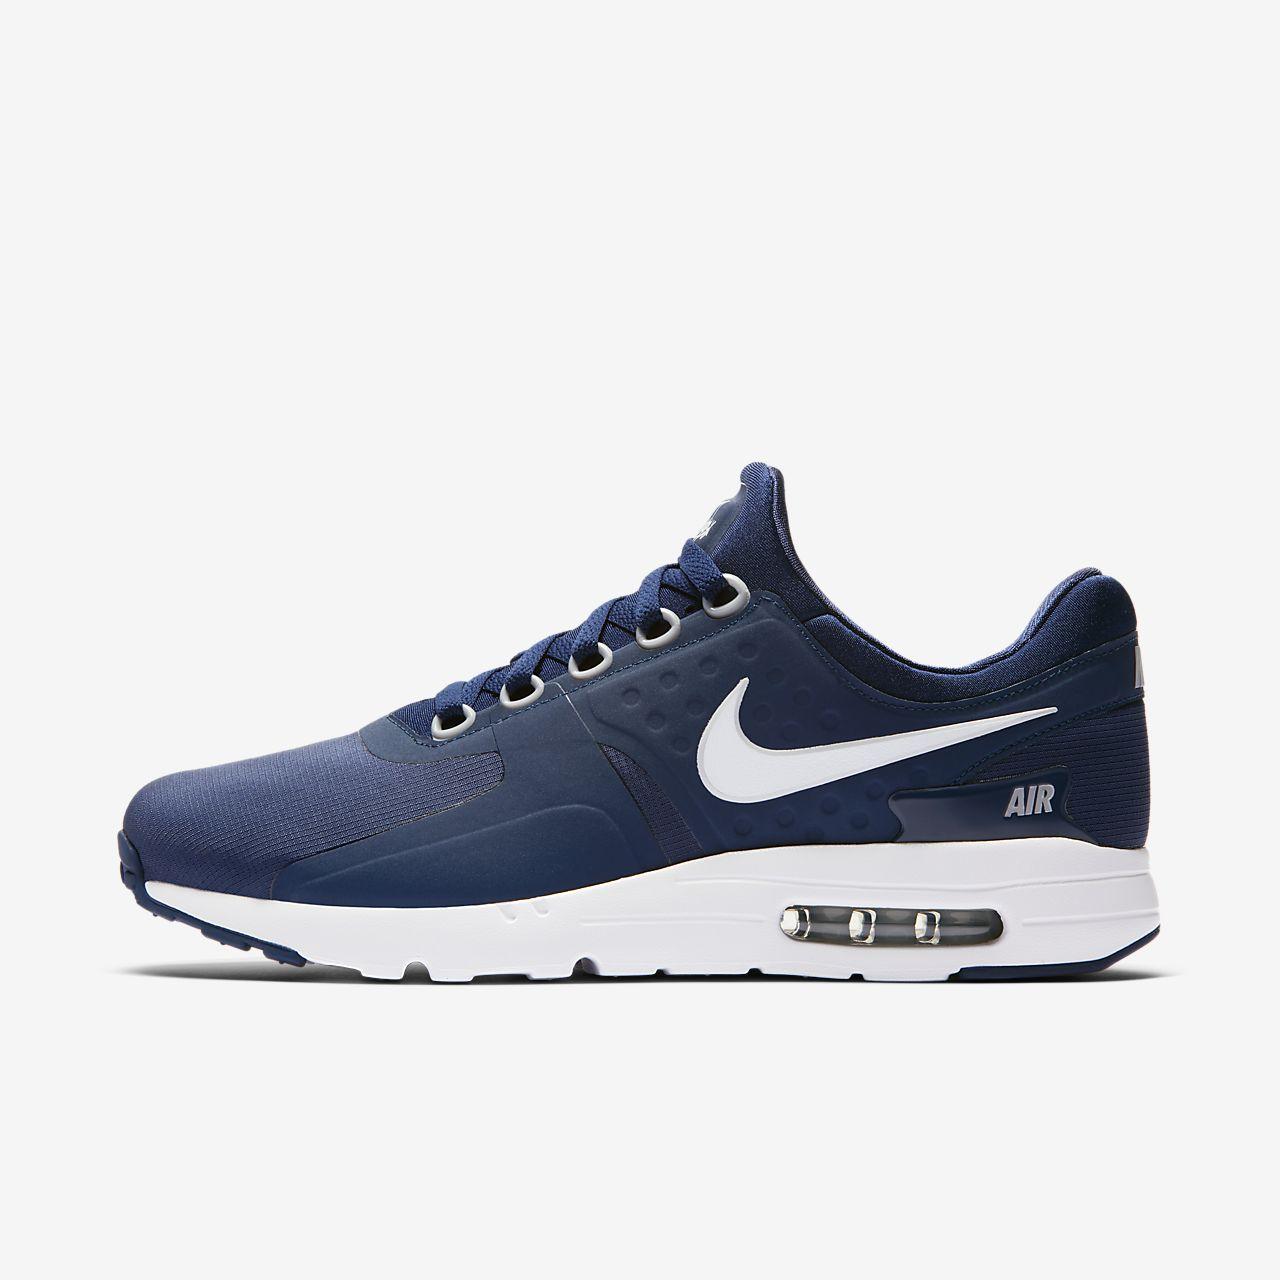 19660646190ac Nike Air Max Zero Essential Men s Shoe. Nike.com FI